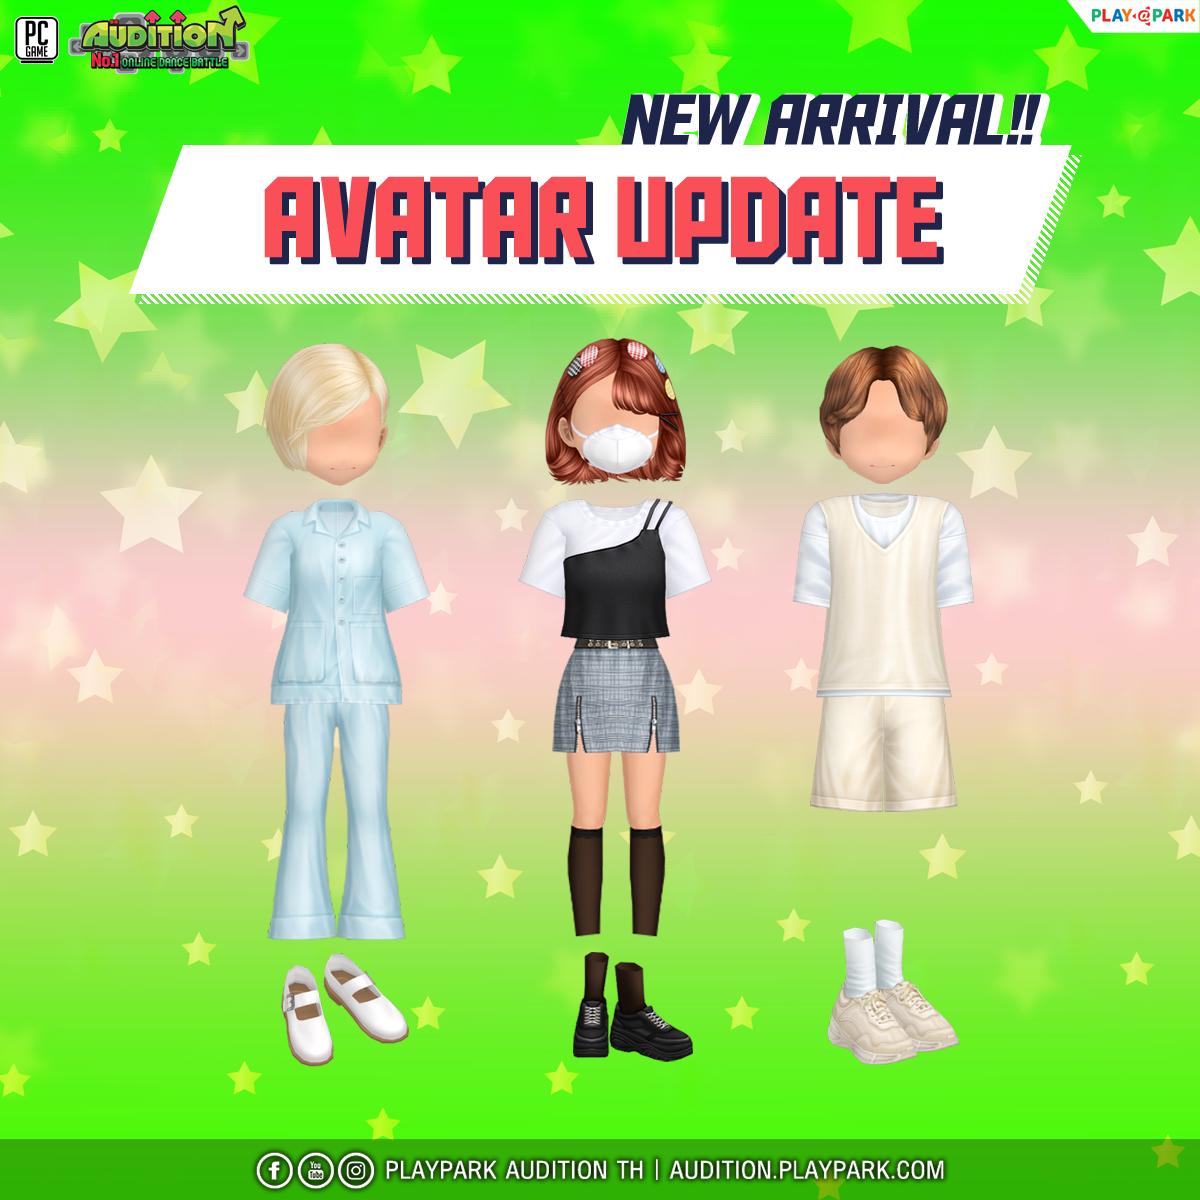 [AUDITION14th] 21 ตุลาคมนี้ อัปเดตเพลงใหม่ Couplename item, Aniticon และไอเทมใหม่ !!